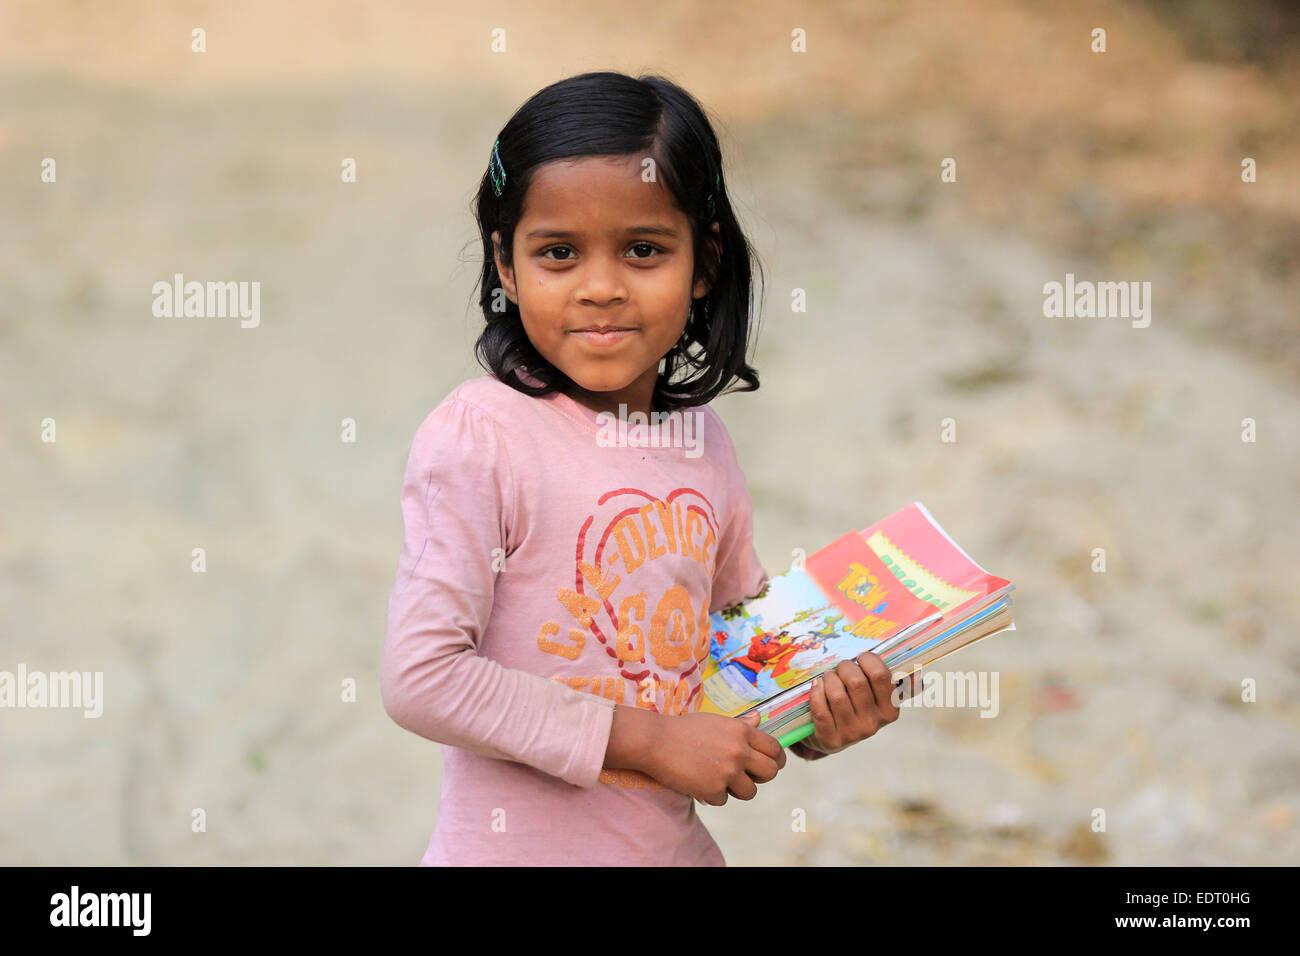 January 2015. School-girl with book in dhaka. Stock Photo